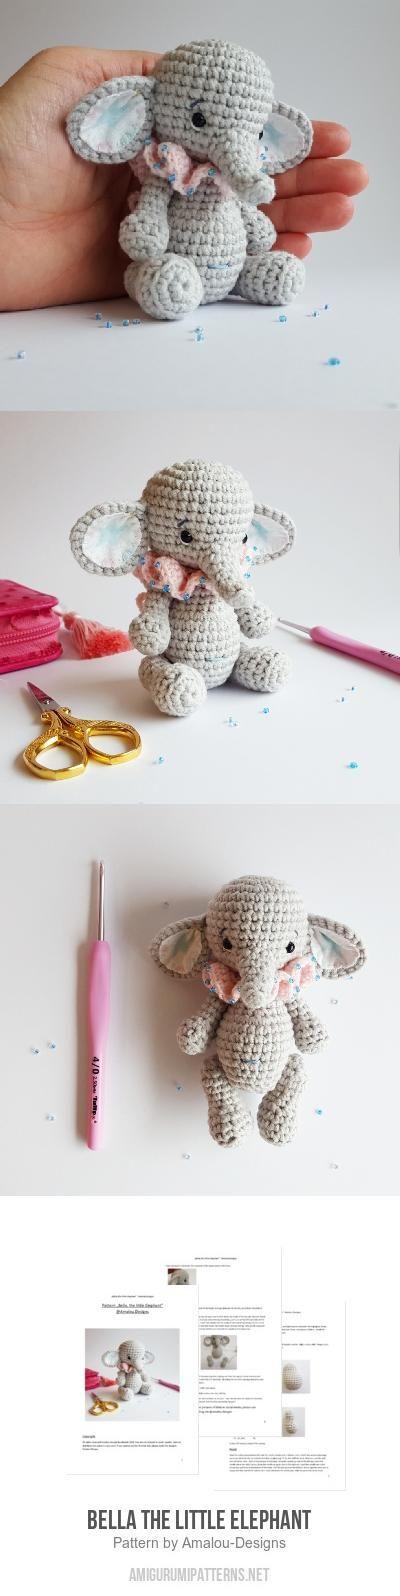 Bella The Little Elephant Amigurumi Pattern | Amigurumis ...